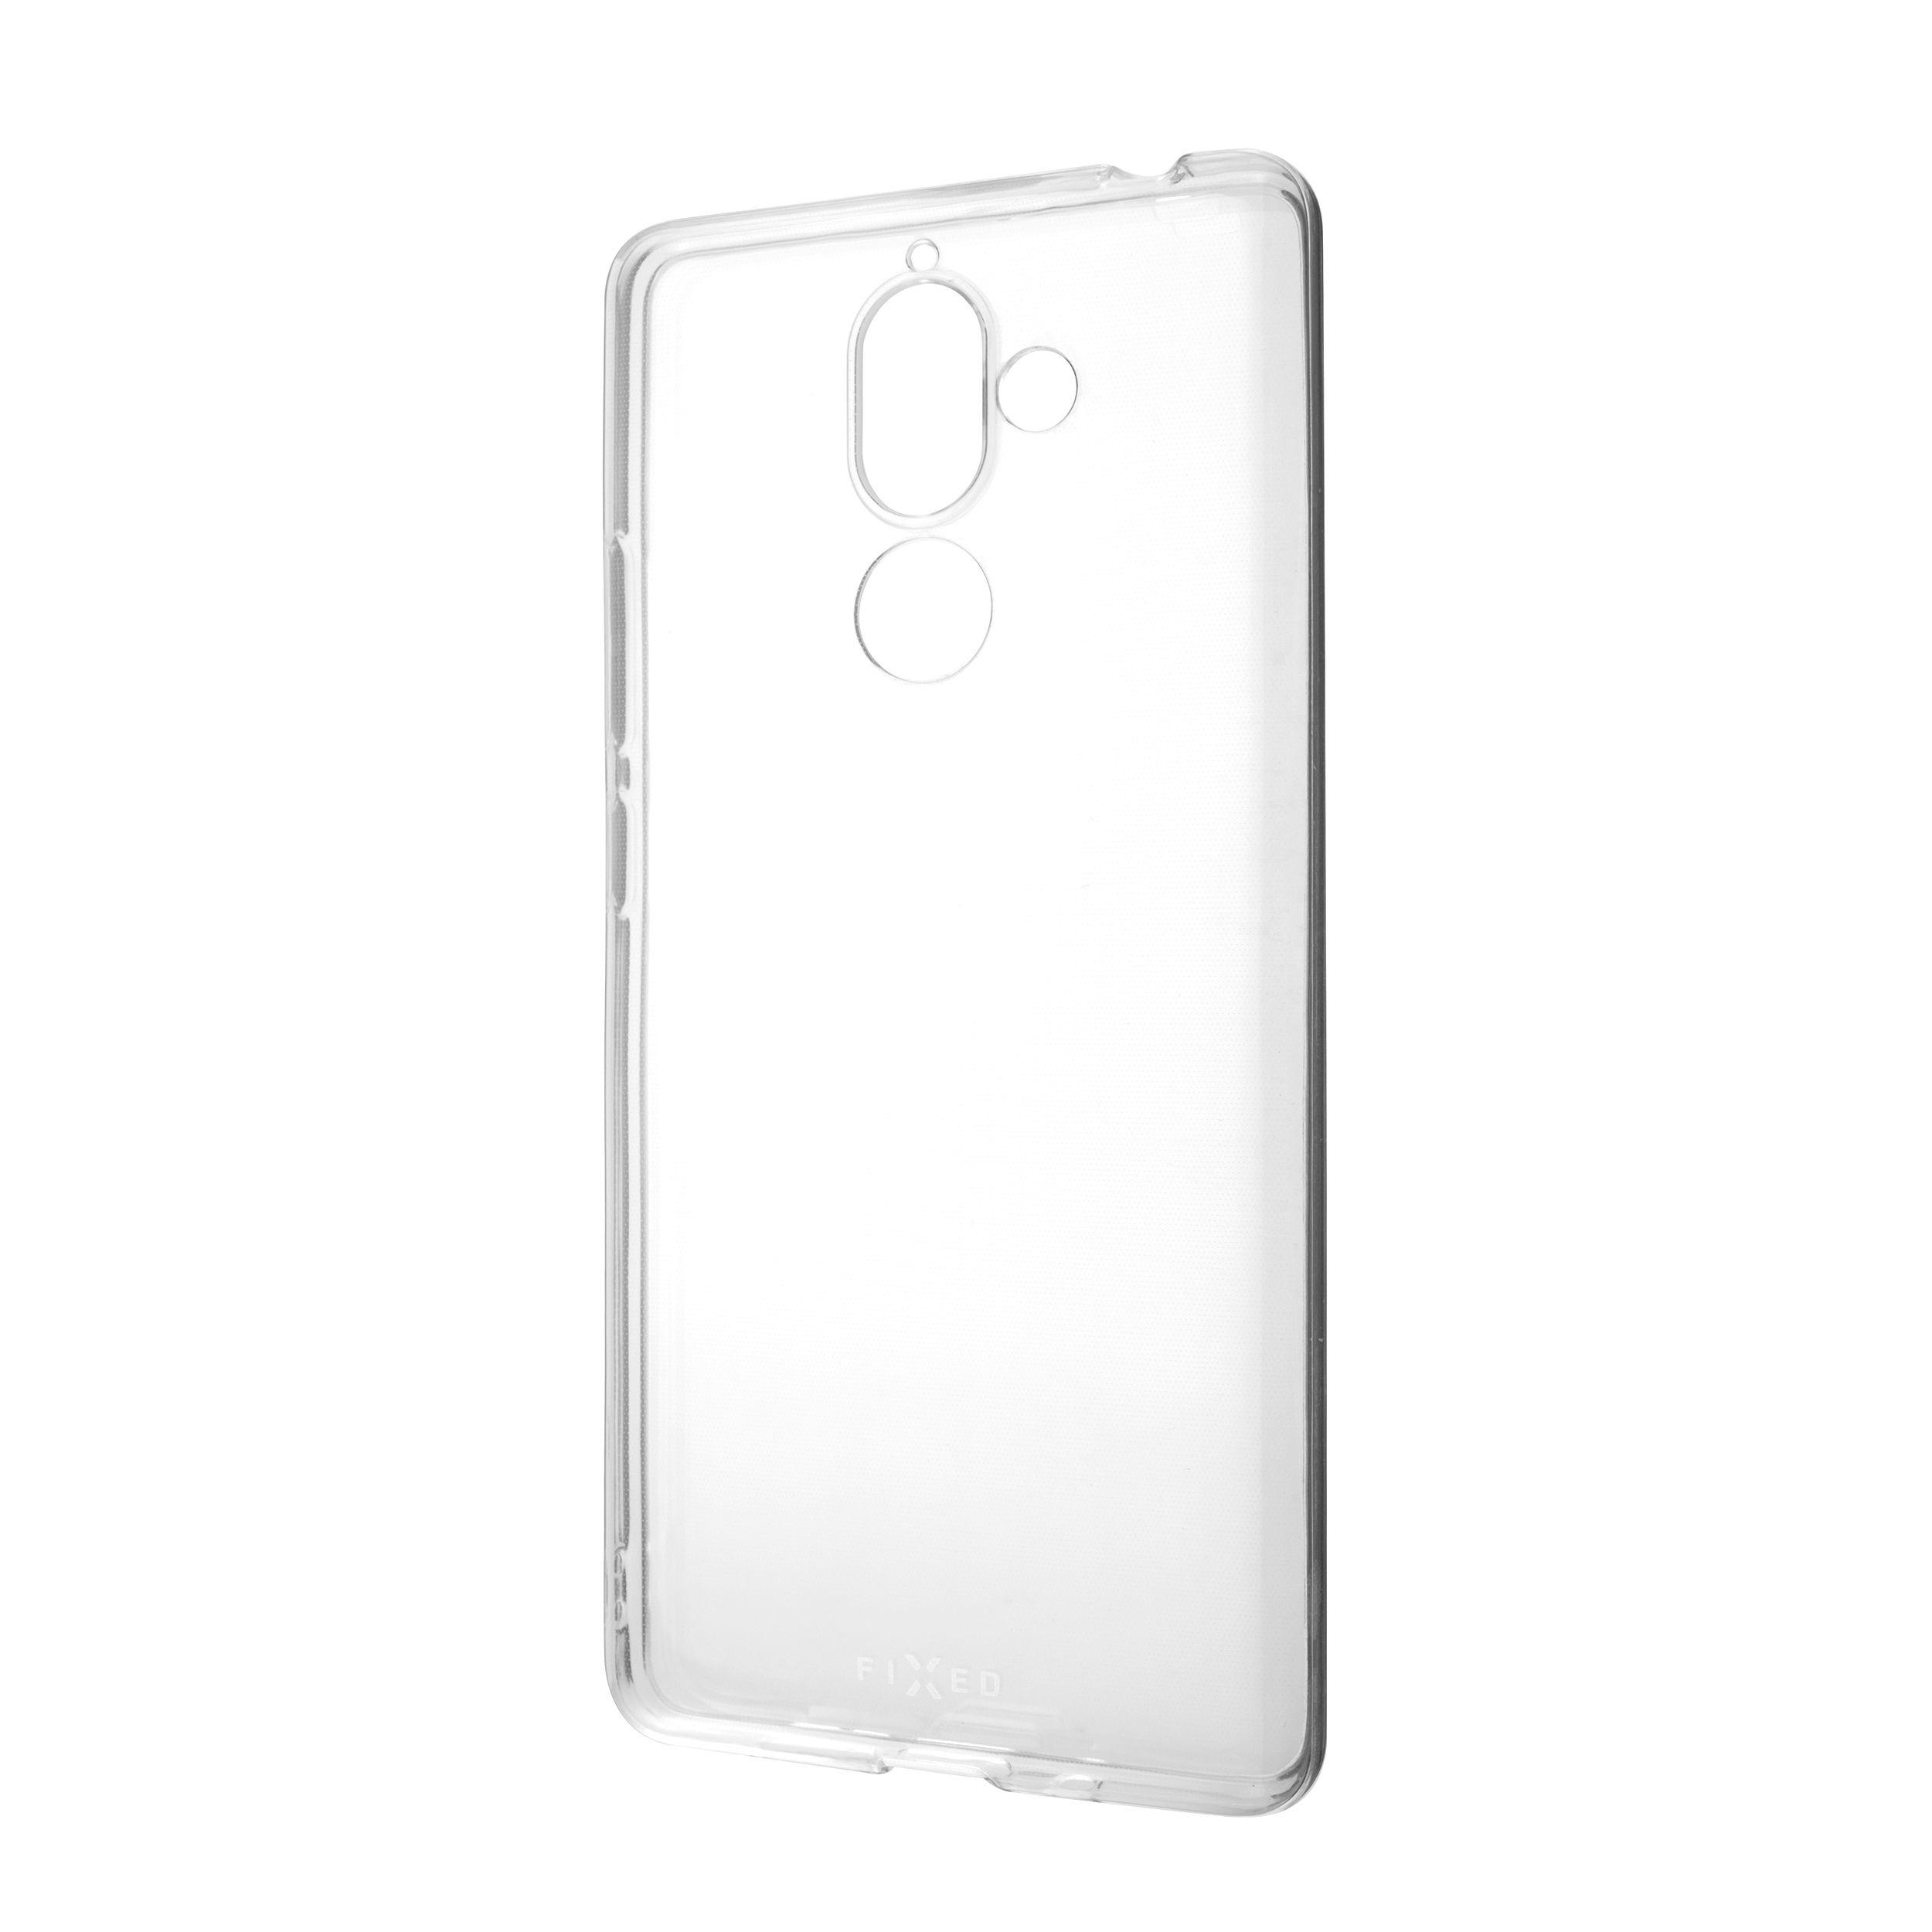 Ultratenké TPU gelové pouzdro FIXED Skin pro Nokia 7 Plus, 0,6 mm, čiré